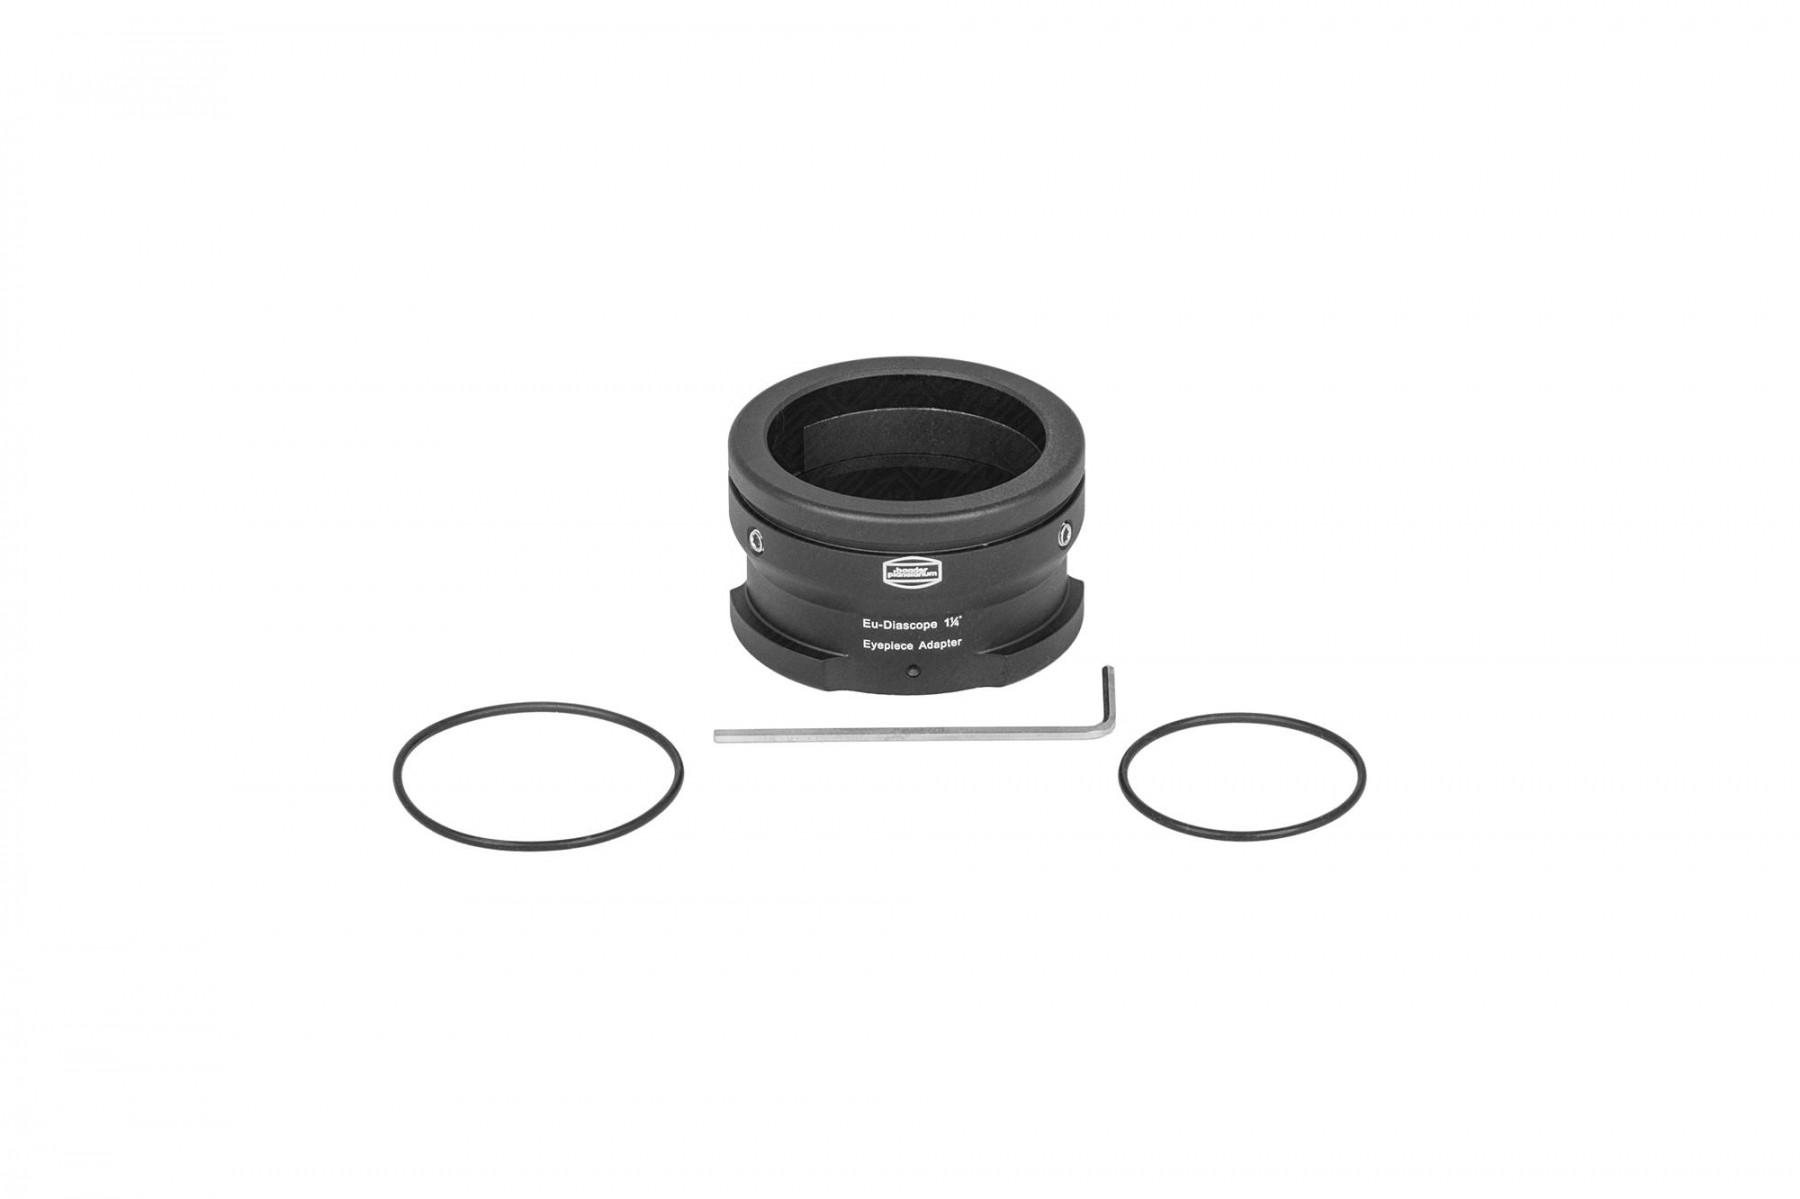 Lieferumfang: Classic Ortho 6mm und Hyperion Zoom Barlow (nicht abgebildet) Zeiss Diascope Okularbajonett, Inbusschlüssel, 2x O-Ringe